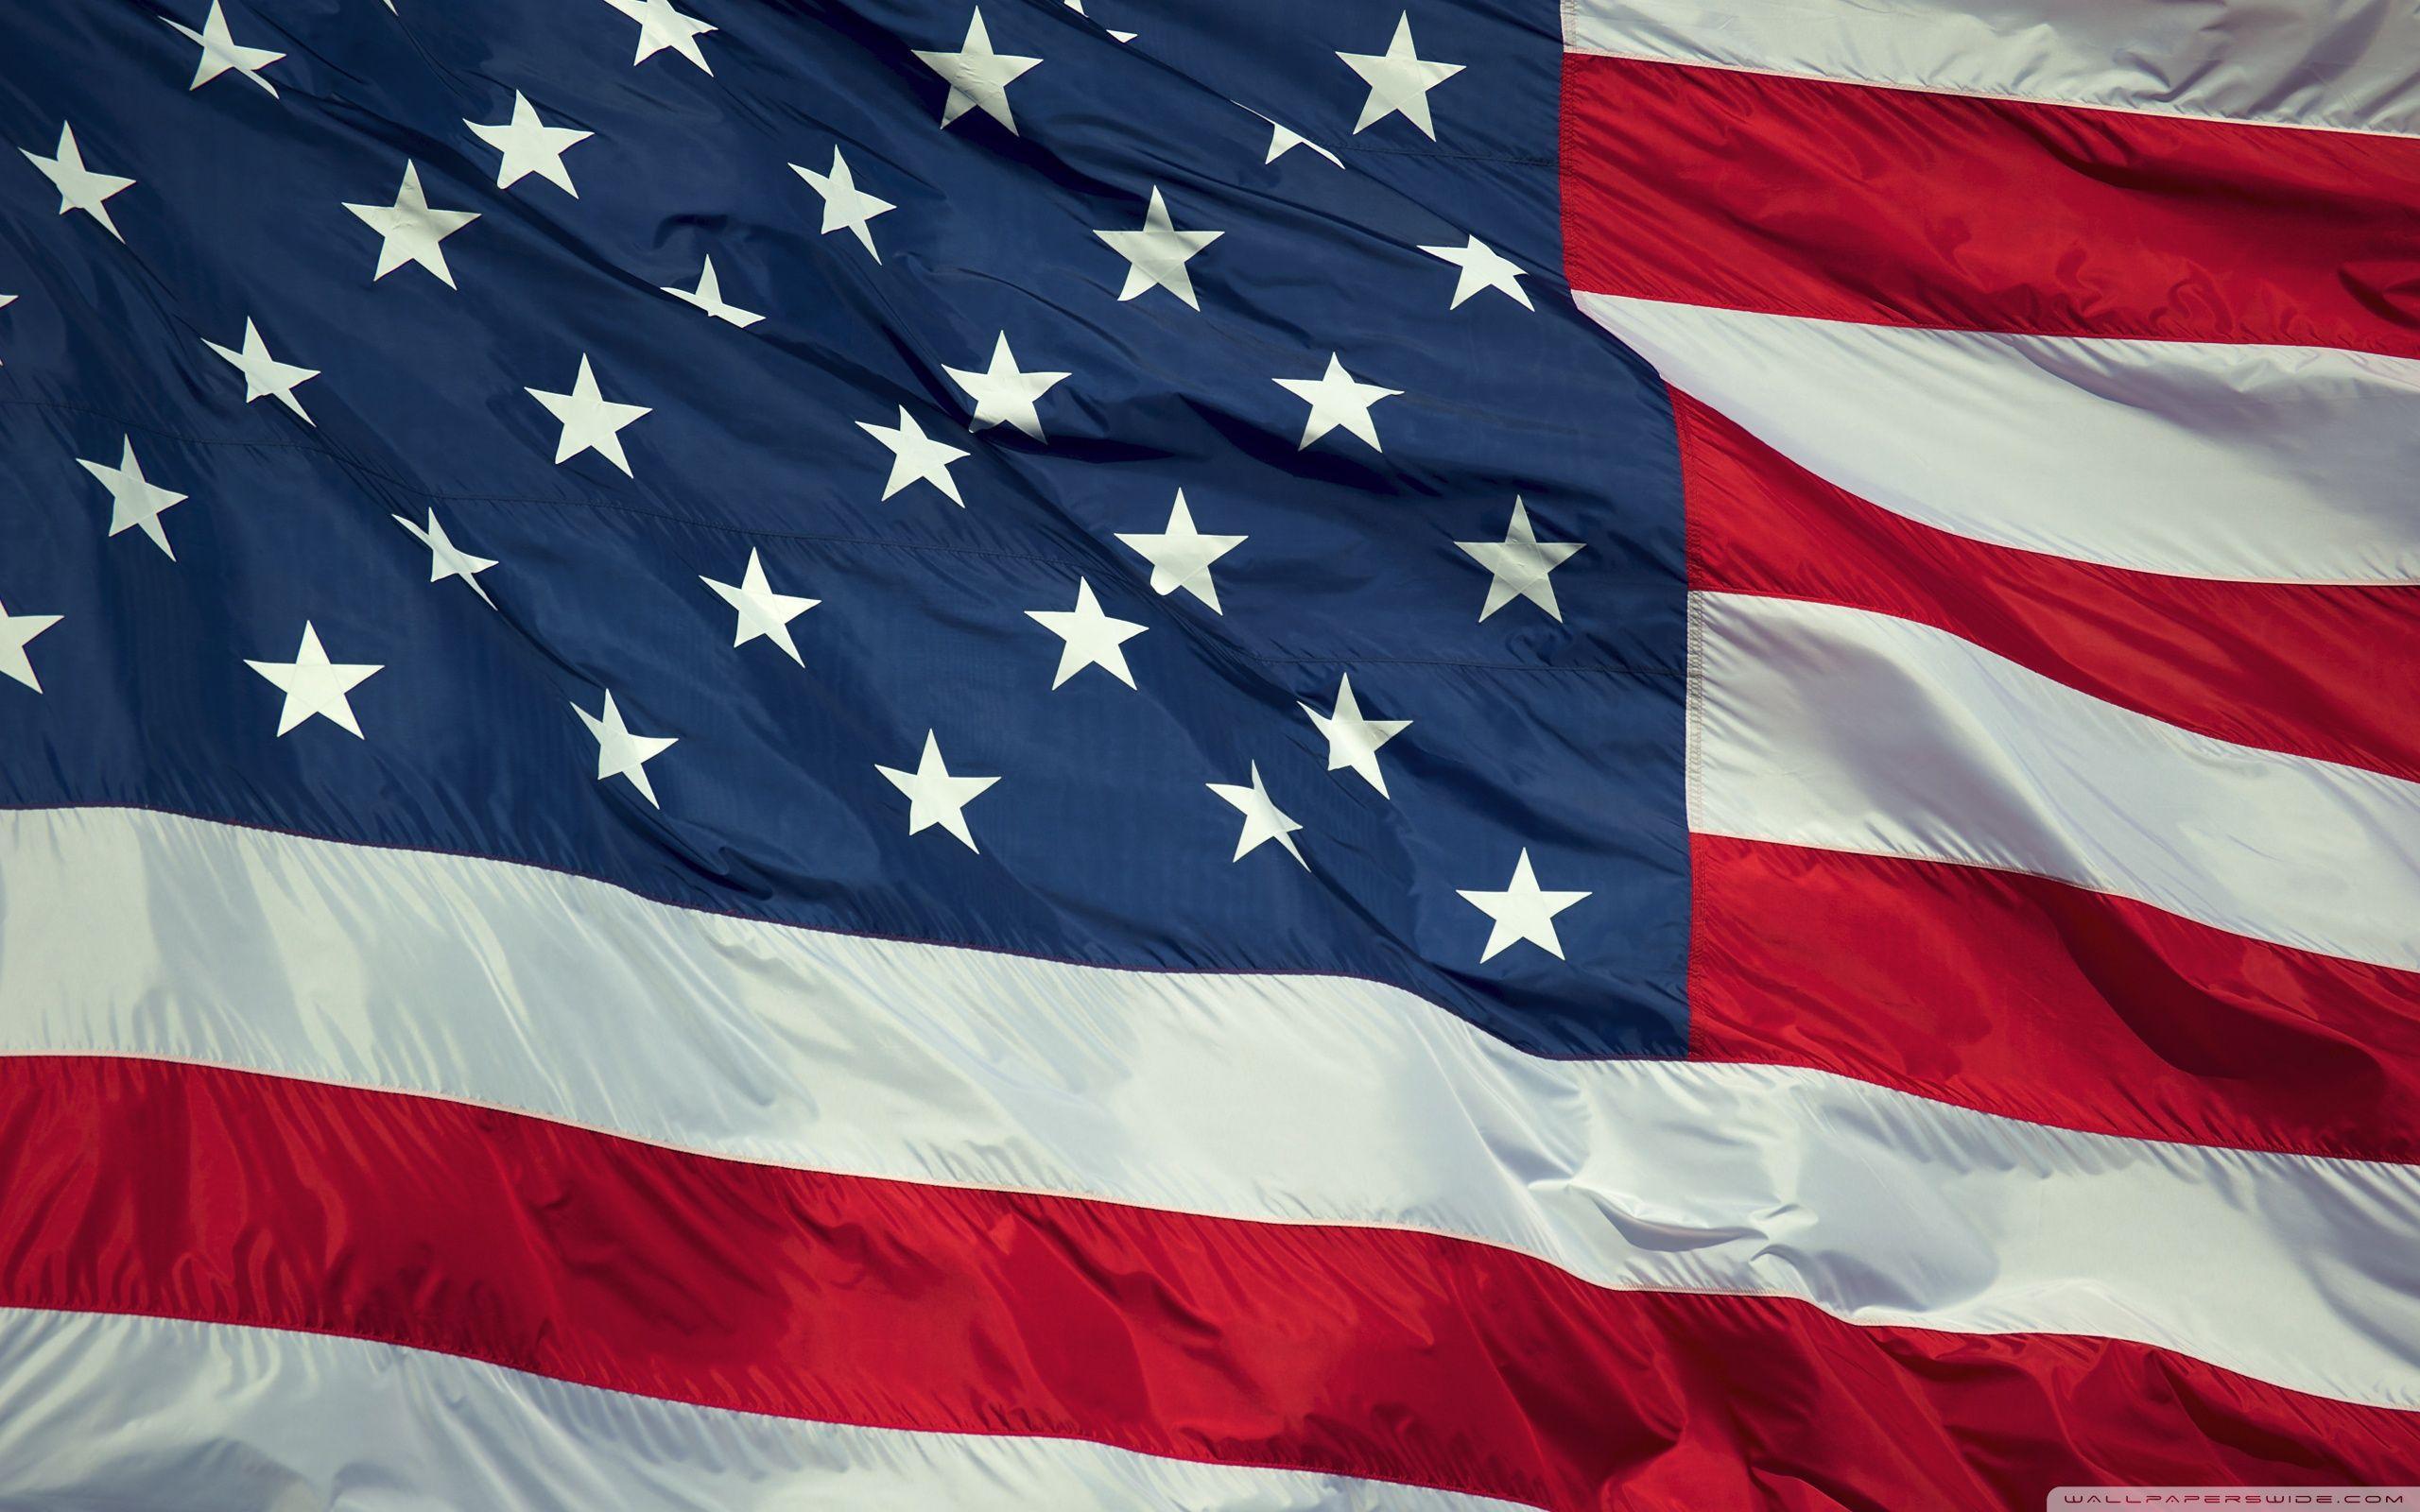 Usa American Flag Desktop Wallpapers Top Free Usa American Flag Desktop Backgrounds Wallpaperaccess